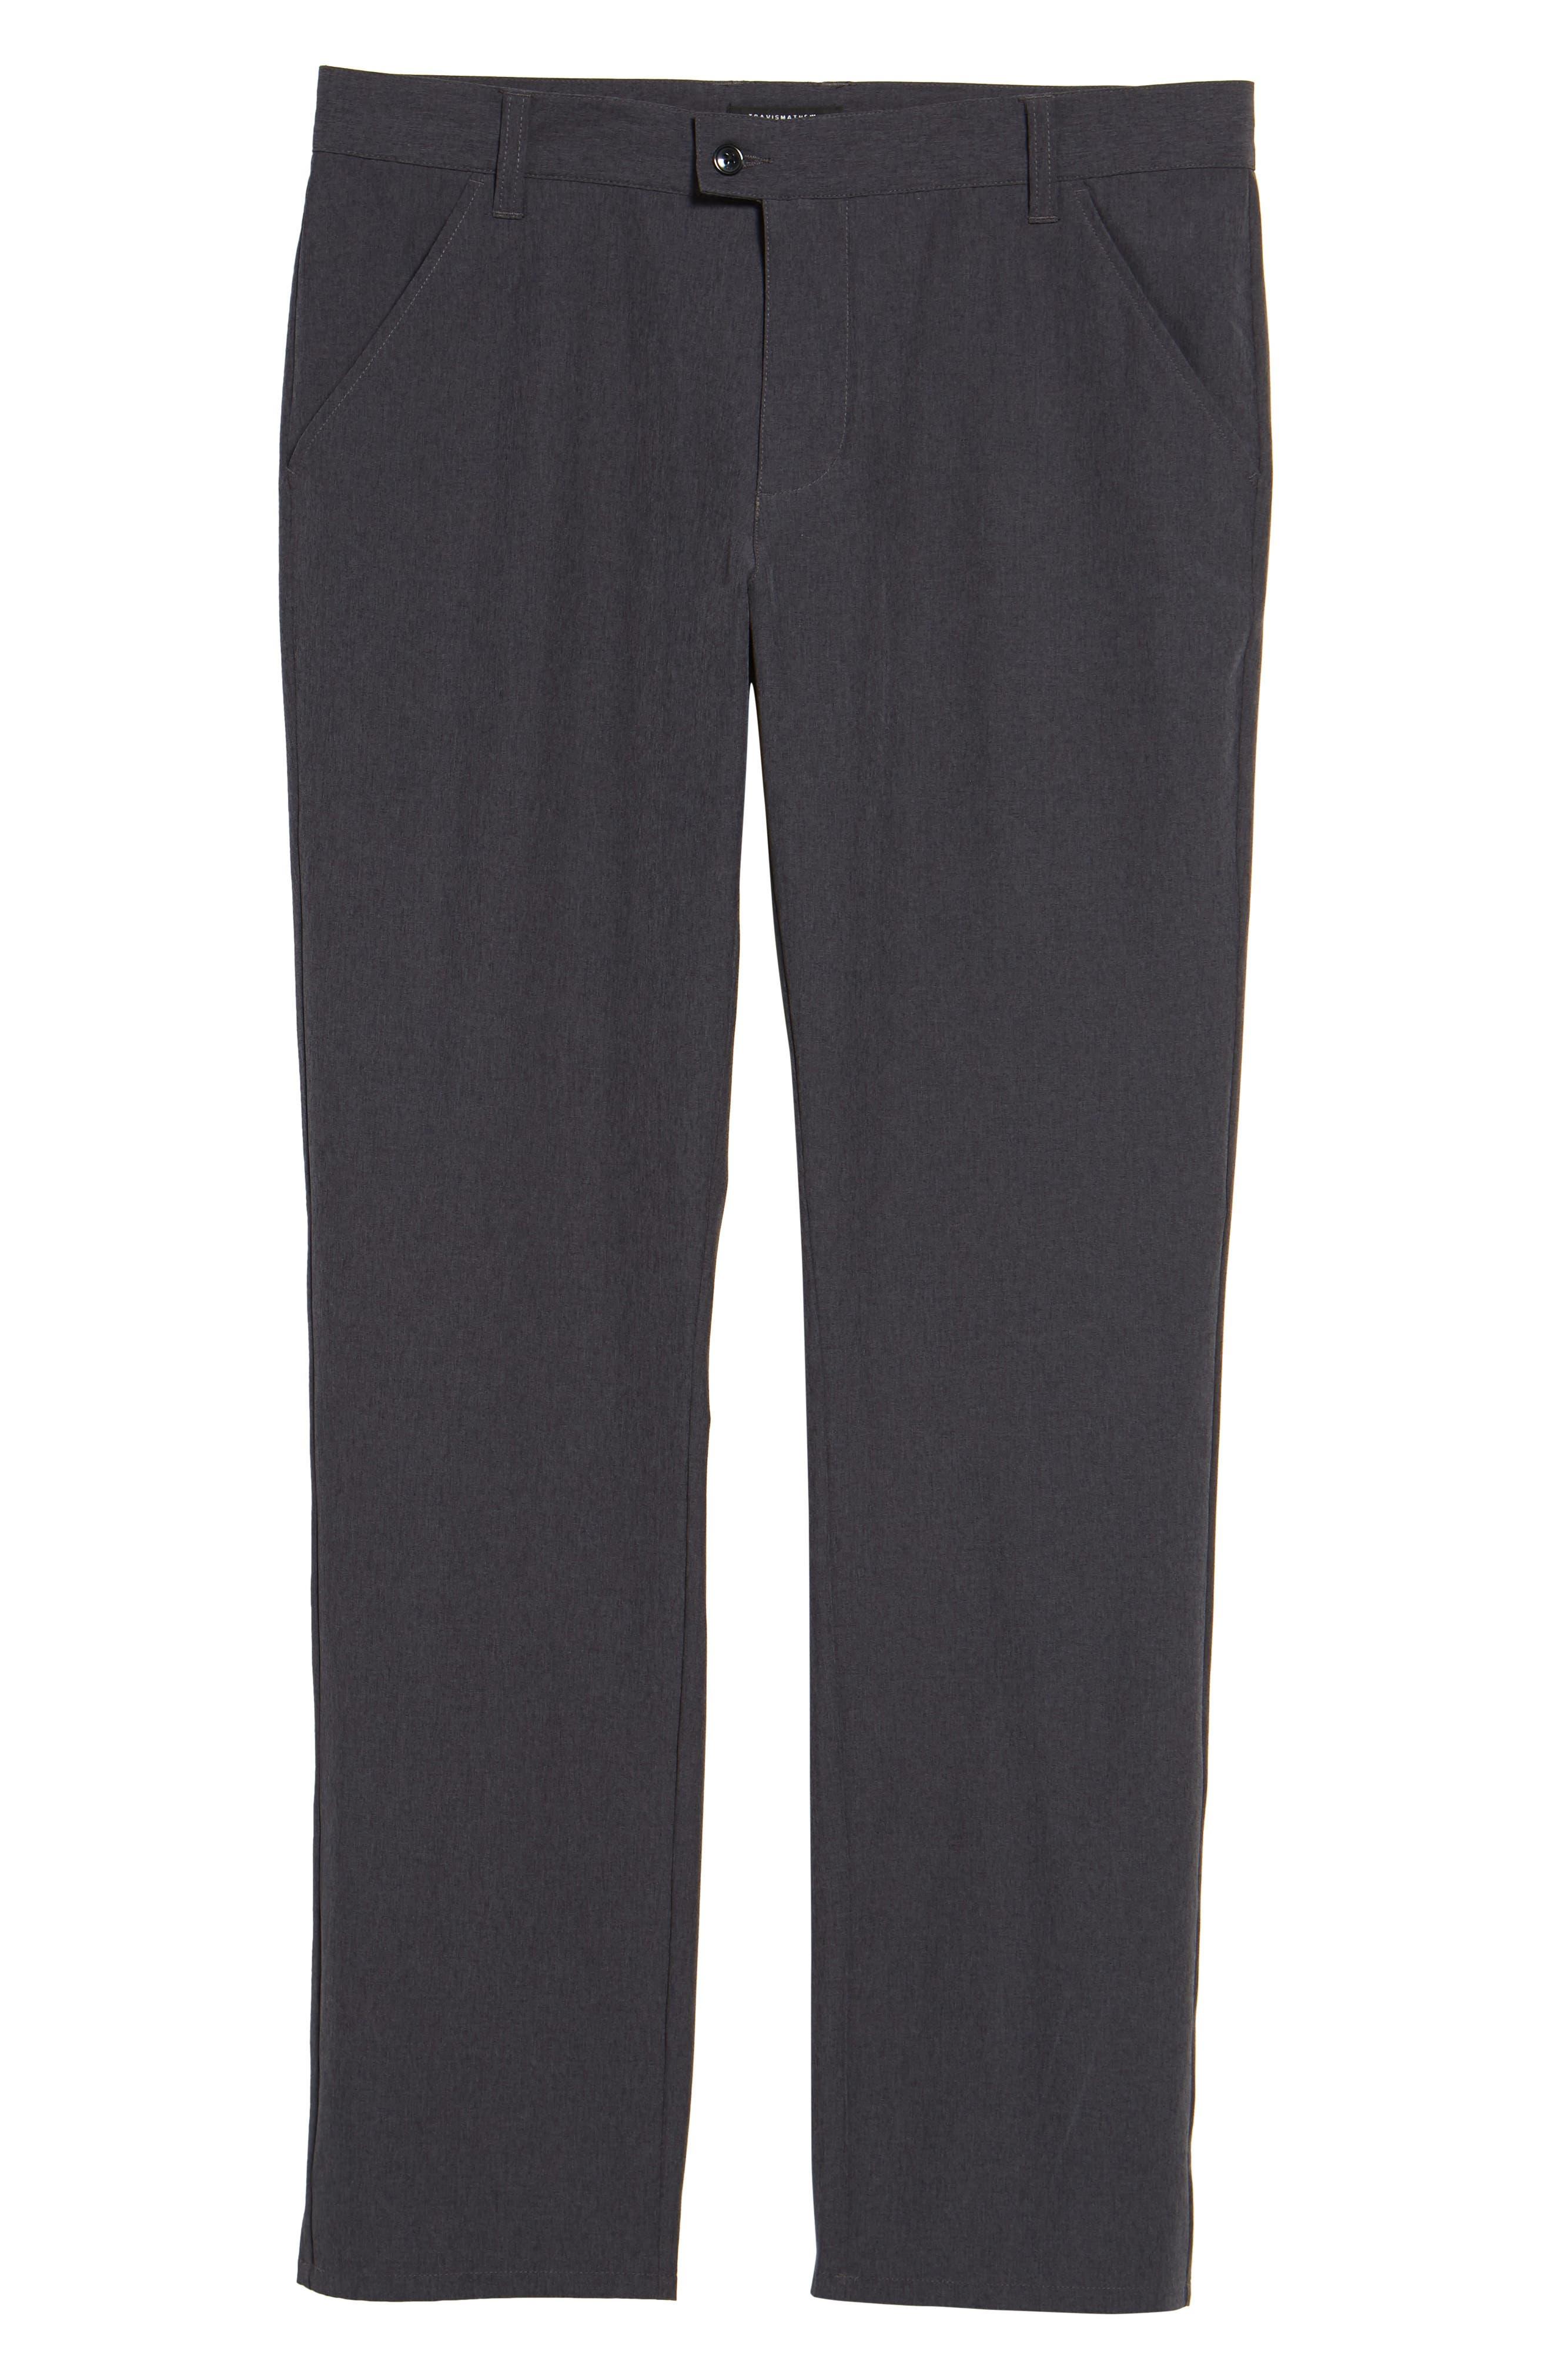 TRAVISMATHEW, Pantladdium Pants, Alternate thumbnail 6, color, HEATHER BLACK